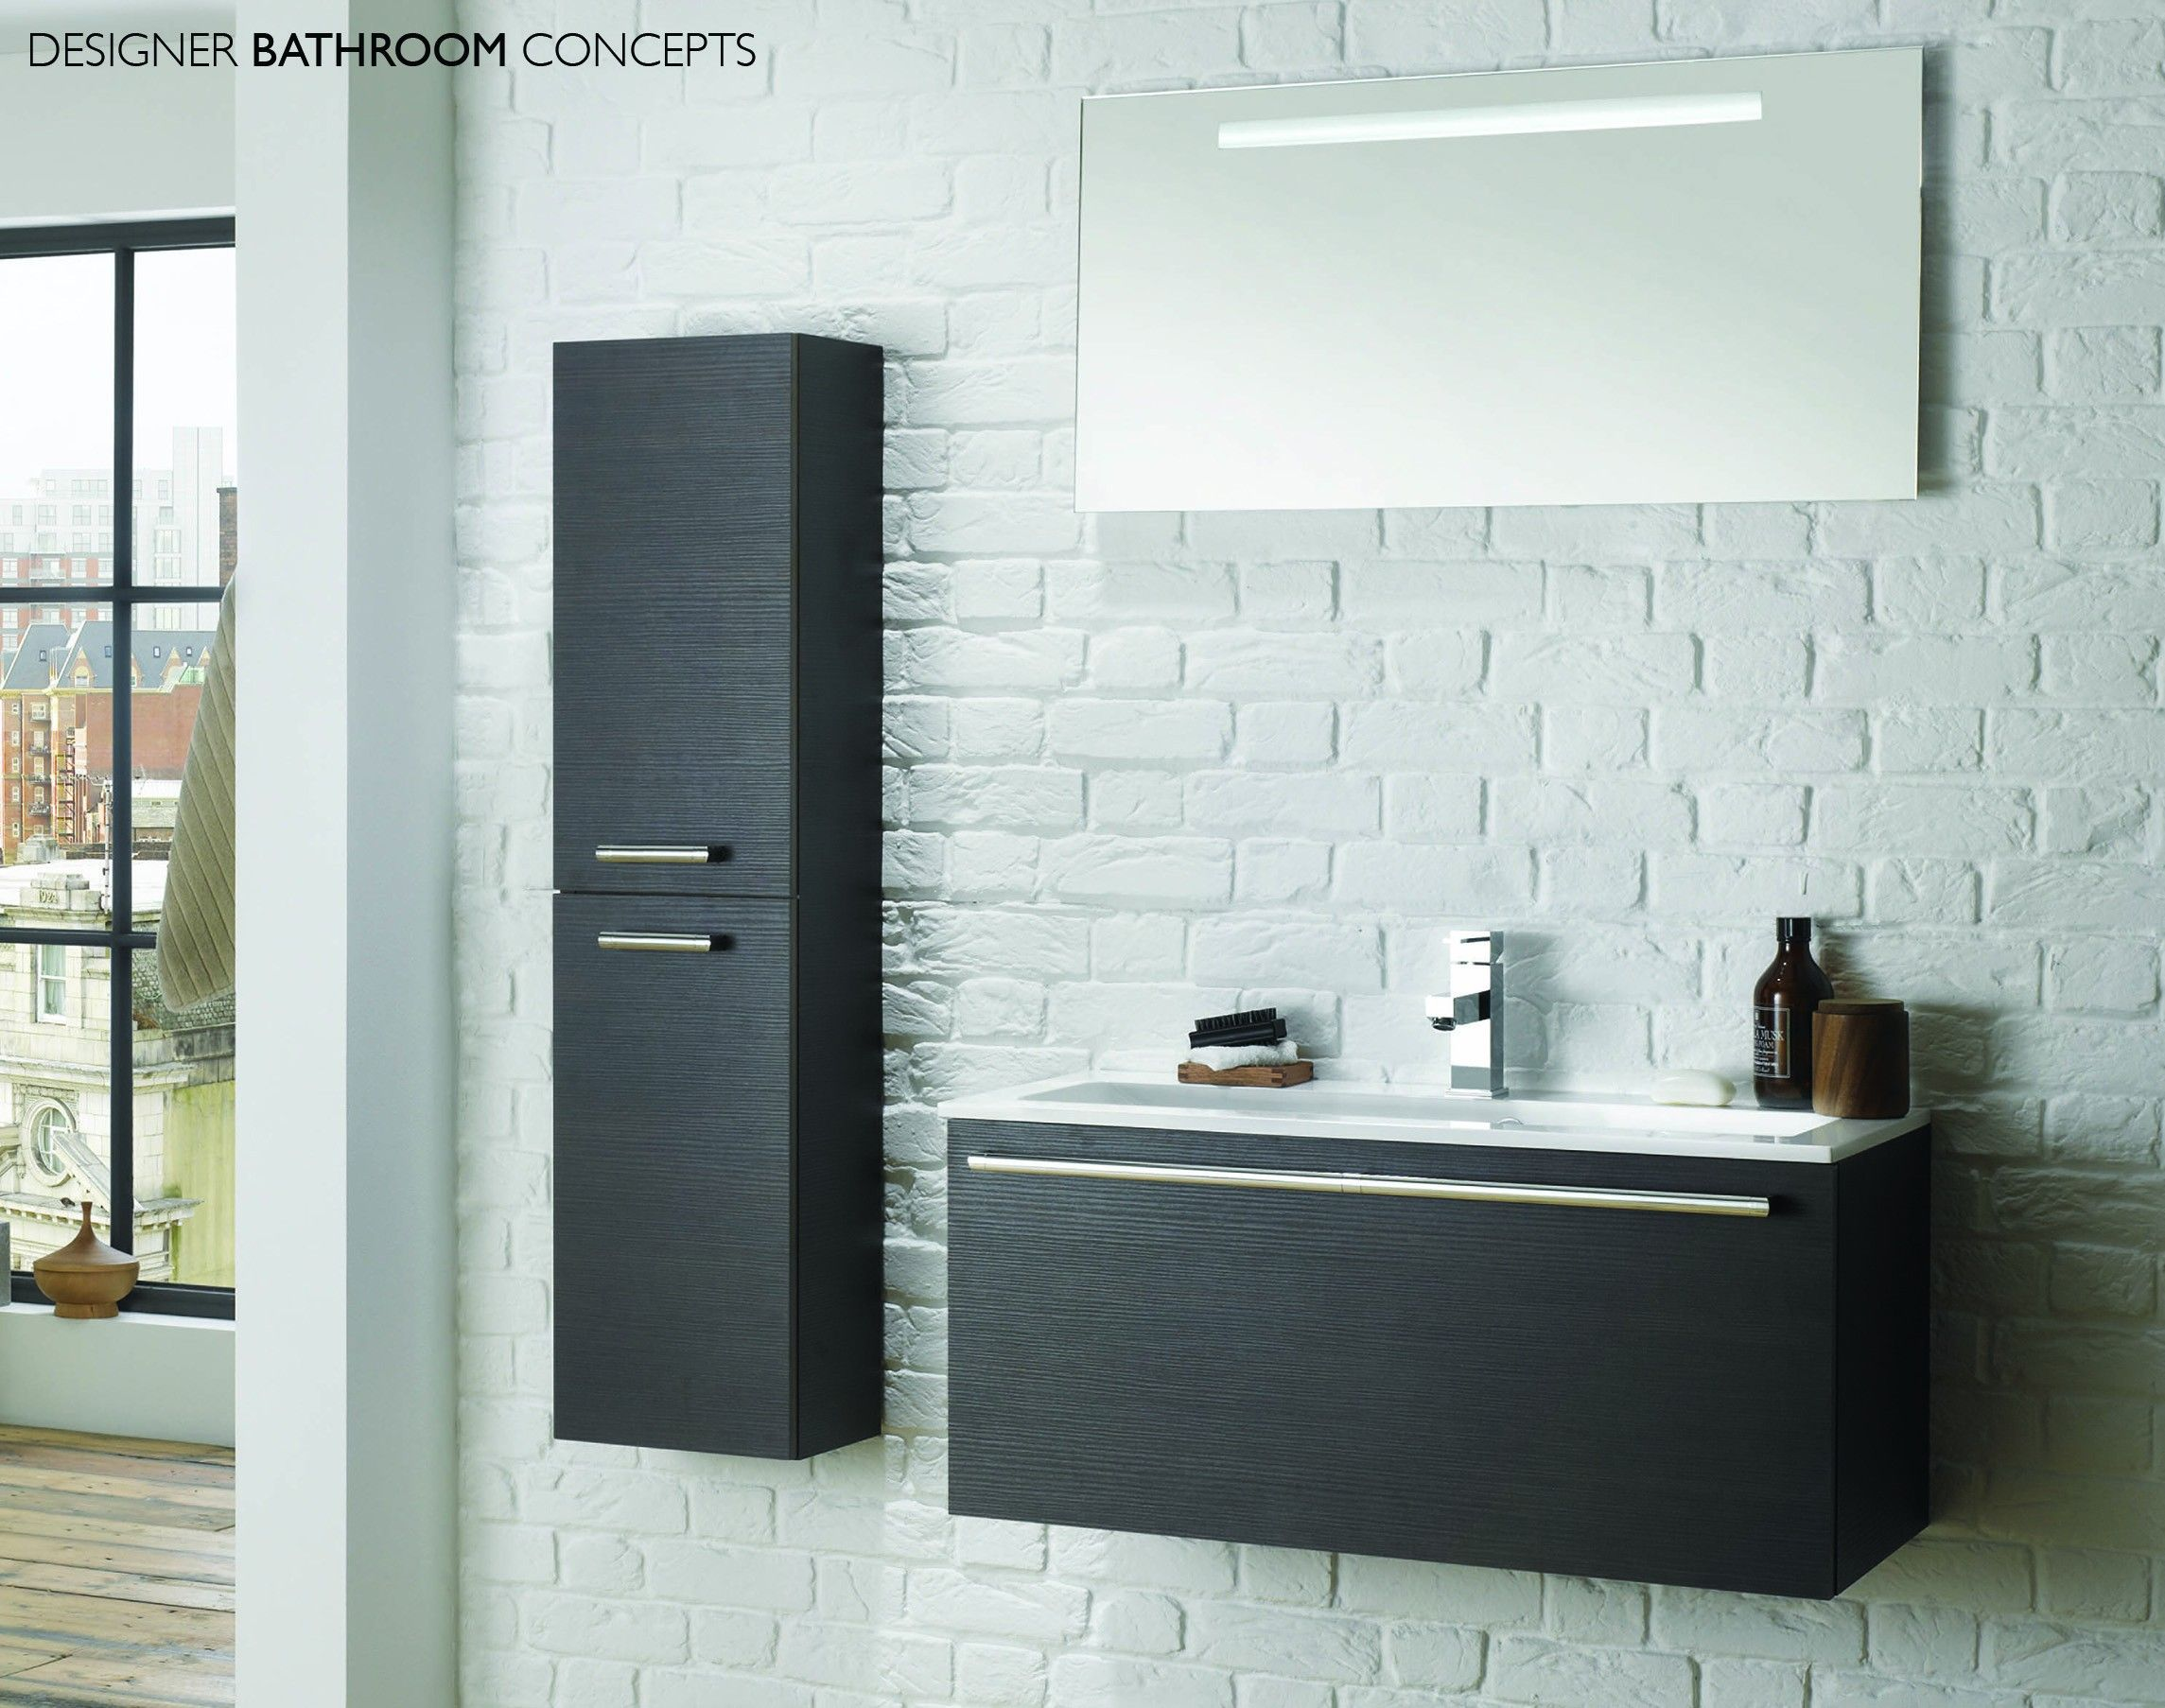 Outre Designer Modular Bathroom Furniture From Designerbathroomconcepts Com Modular Bathrooms Bathroom Furniture